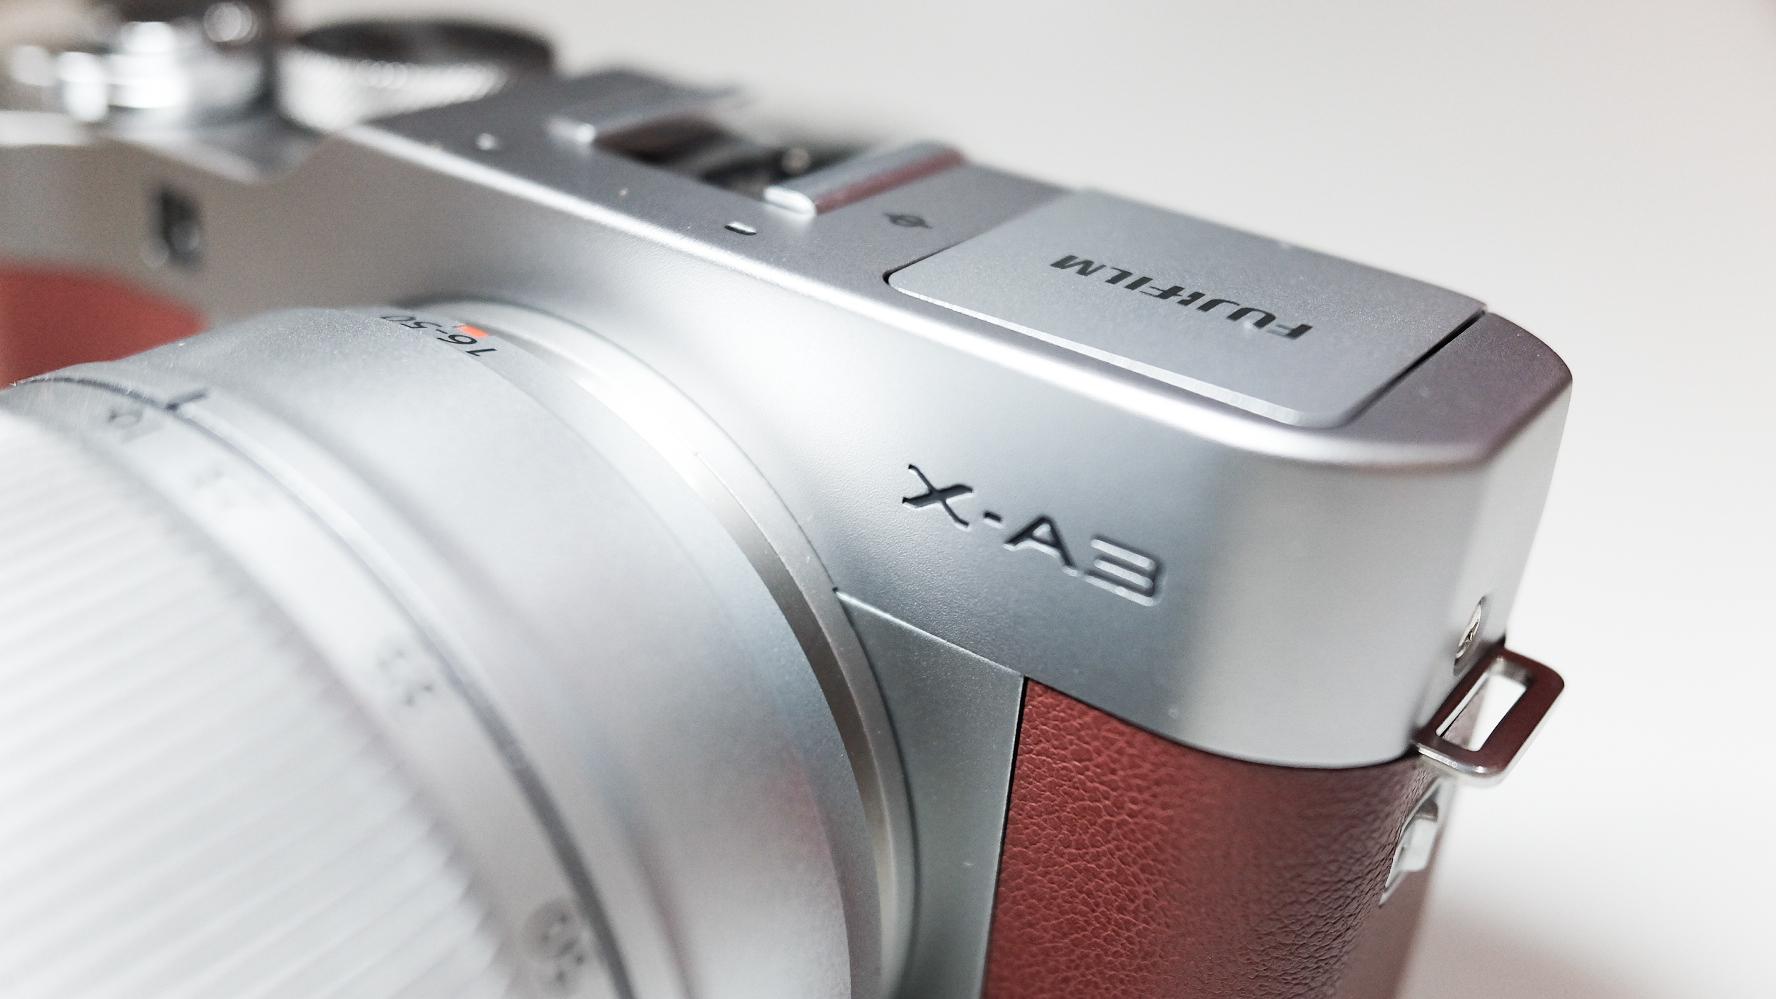 Seputar Kamera Fujifilm Music Social Community X E1 Lensa 18 55mm F 28 4 R Lm Ois Paket Lengkap Beberapa Bulan Sudah Saya Menggunakan Rilisan Baru Dari Ini Dan Sepertinya Harus Menulis Review Mirrorless Xa3 Berdasarkan